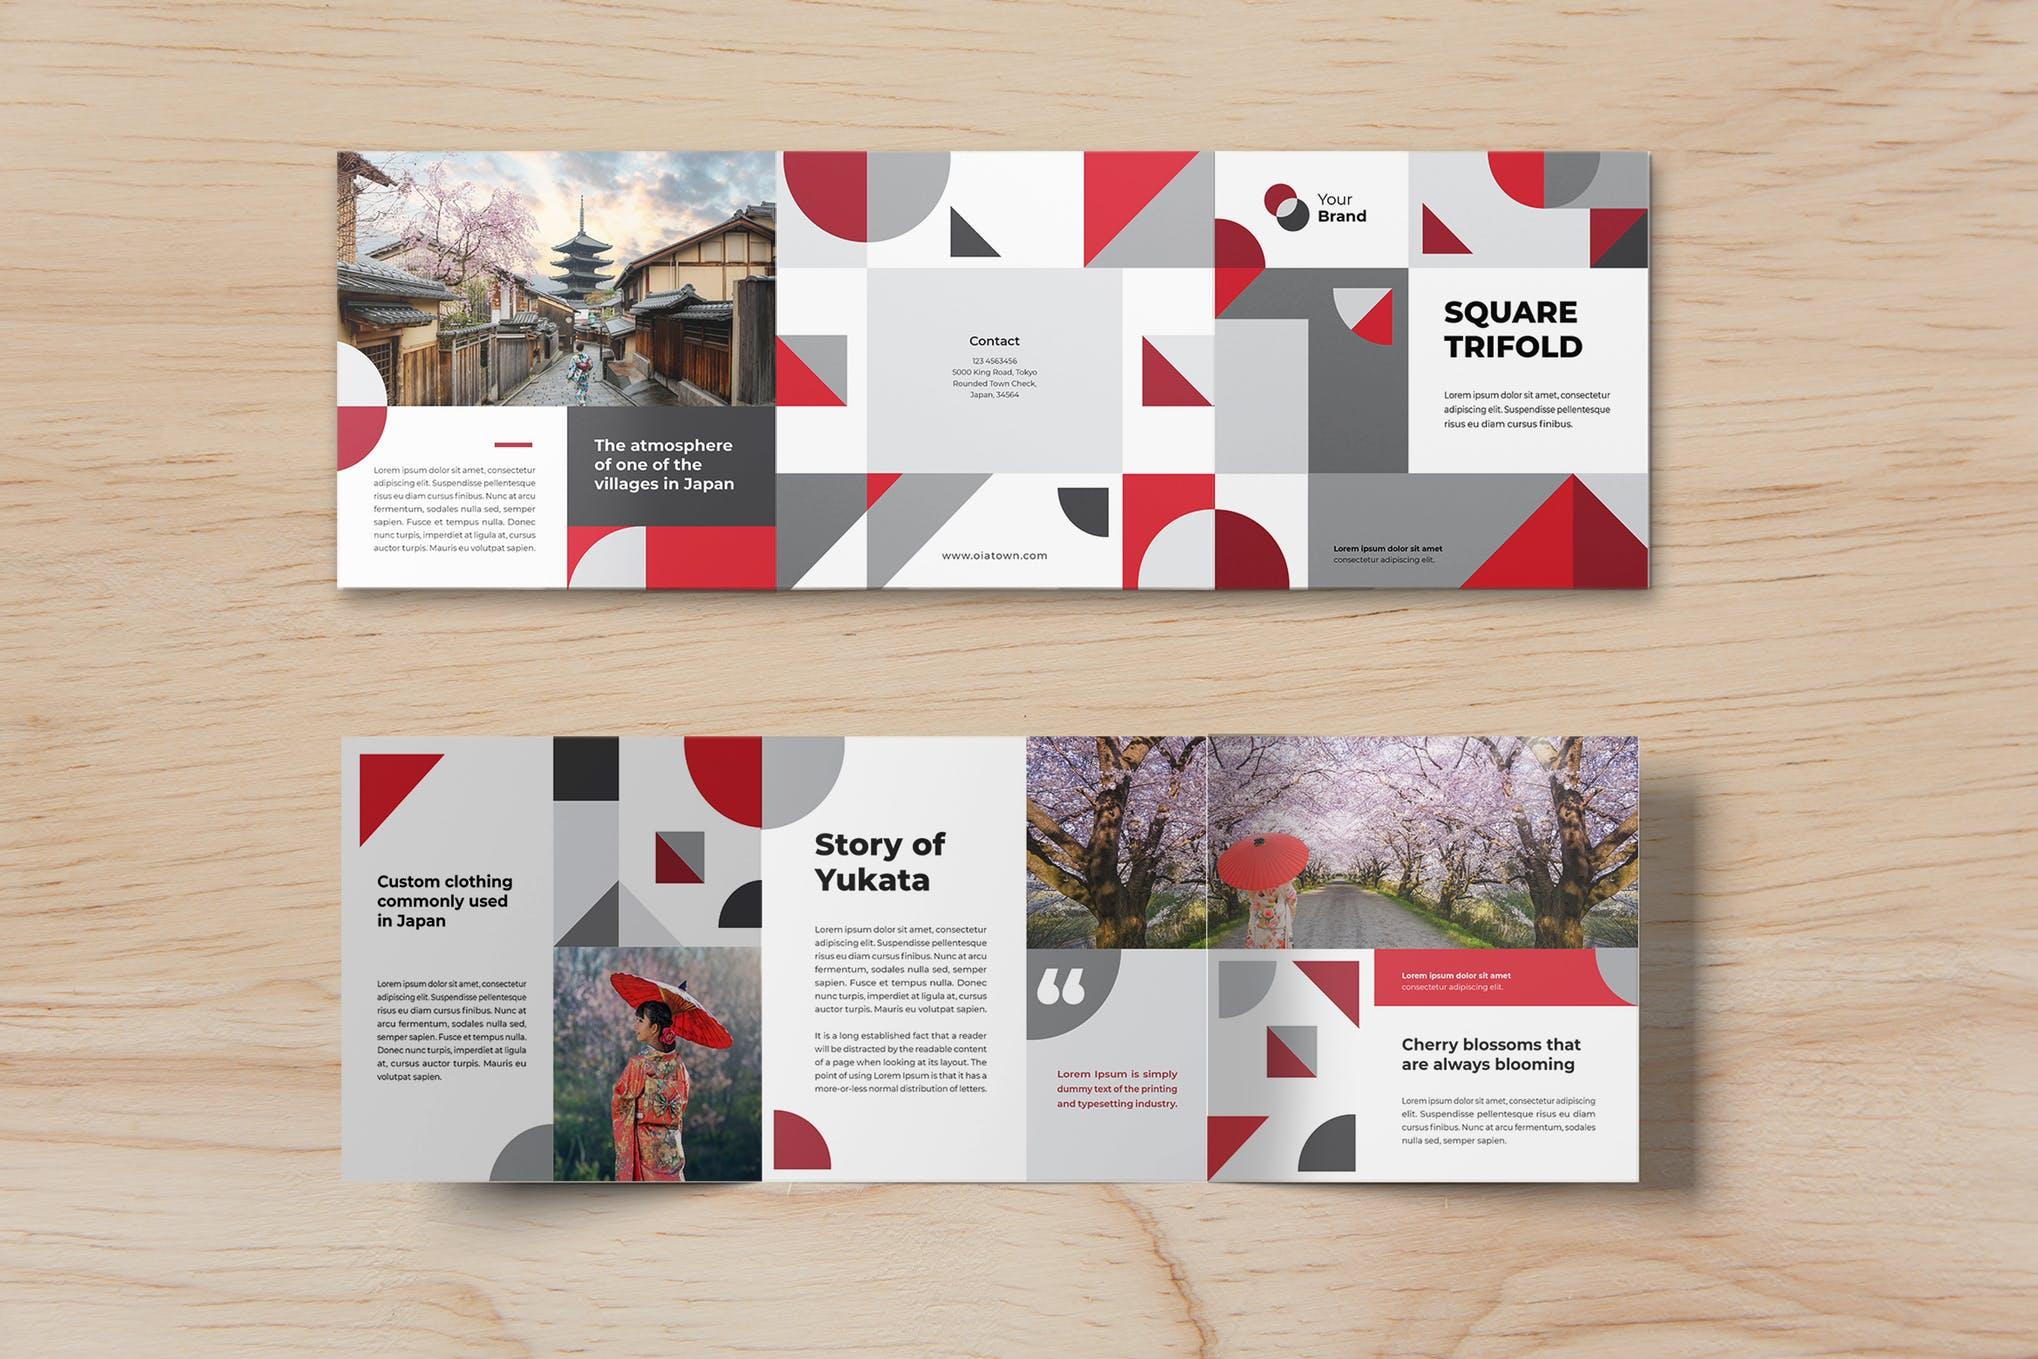 Sakura Square trifold indesign template